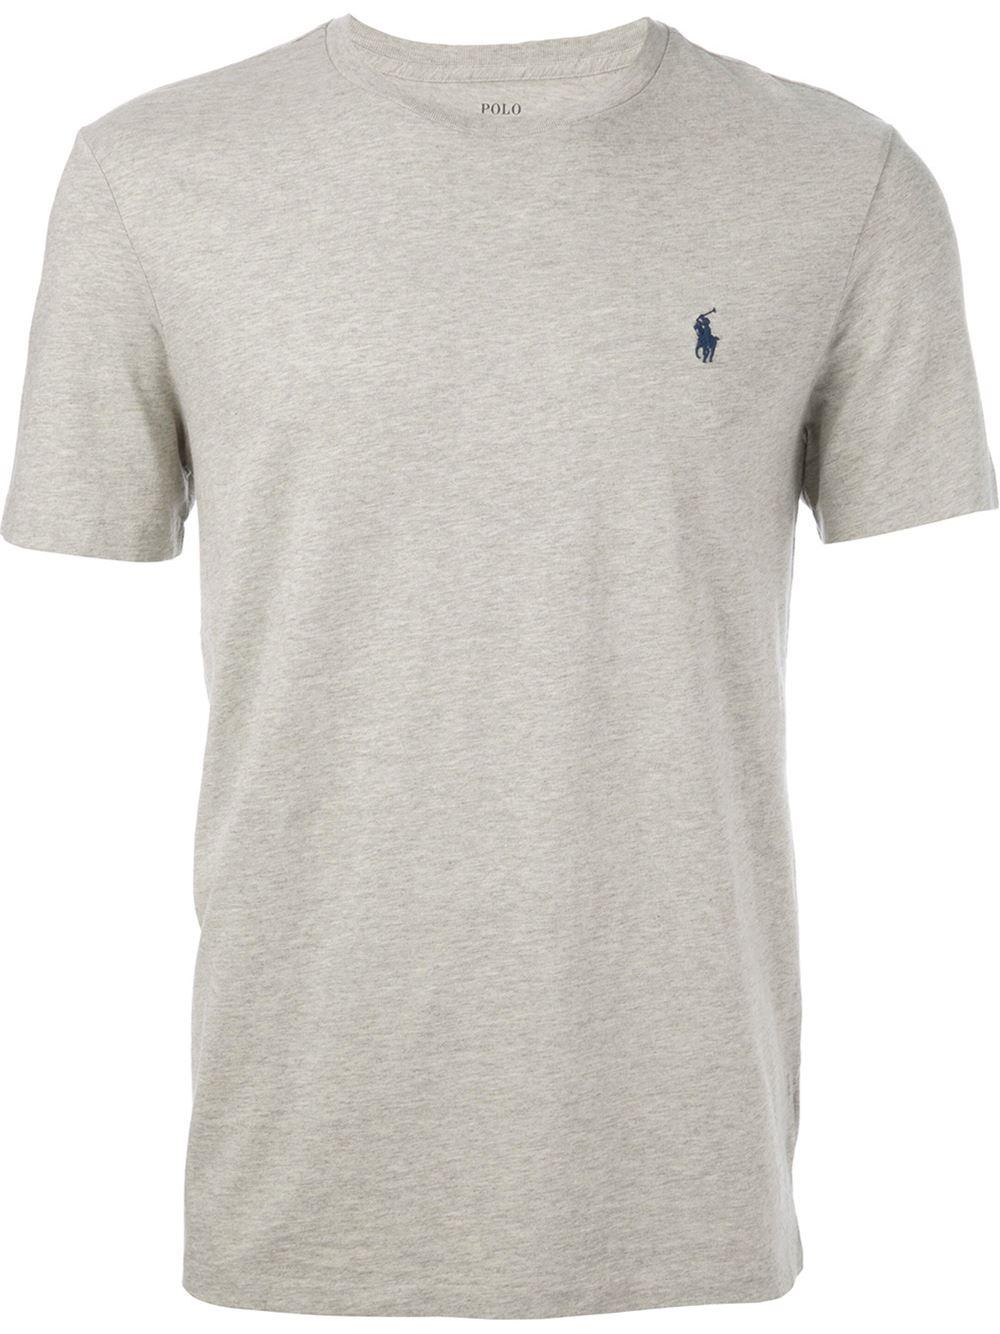 polo ralph lauren logo t shirt in gray for men grey lyst. Black Bedroom Furniture Sets. Home Design Ideas